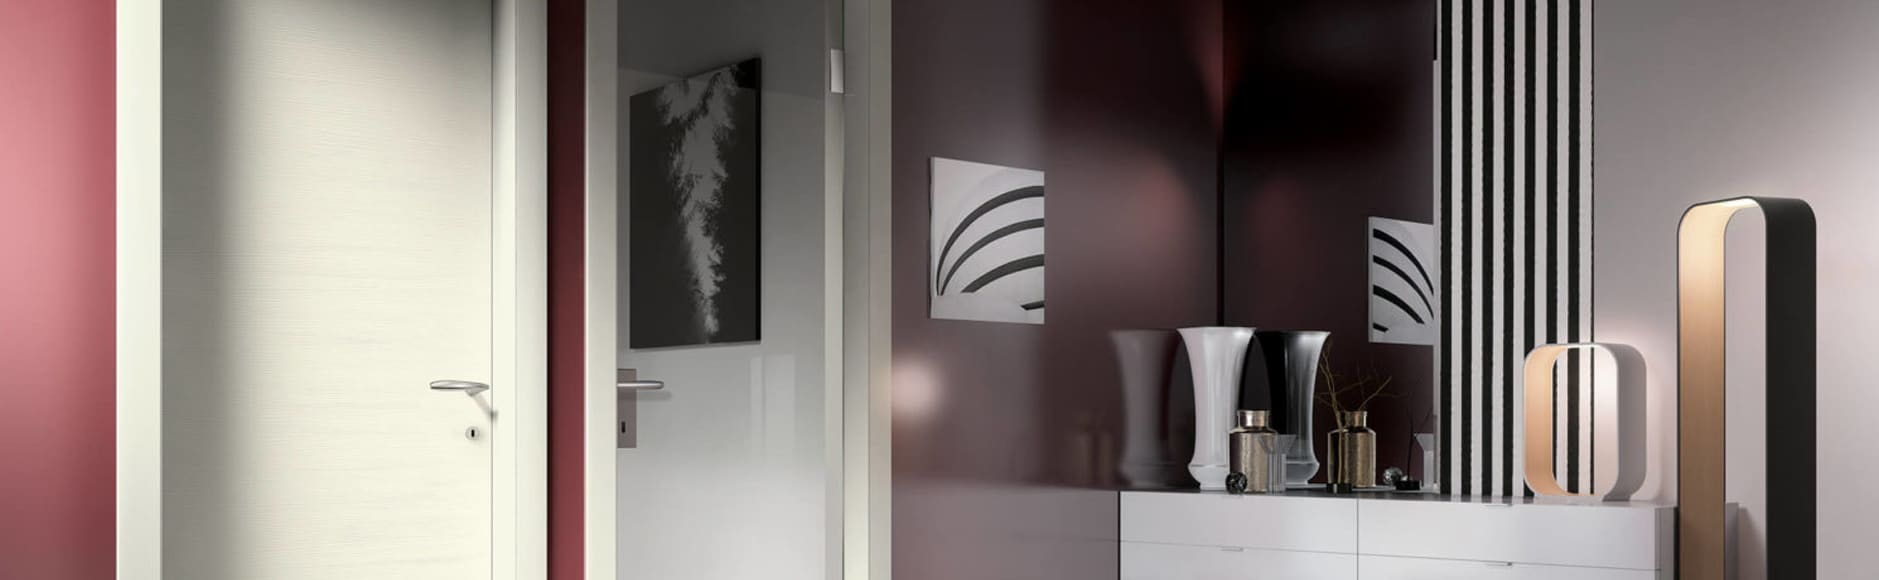 porte moderne in legno bergamo